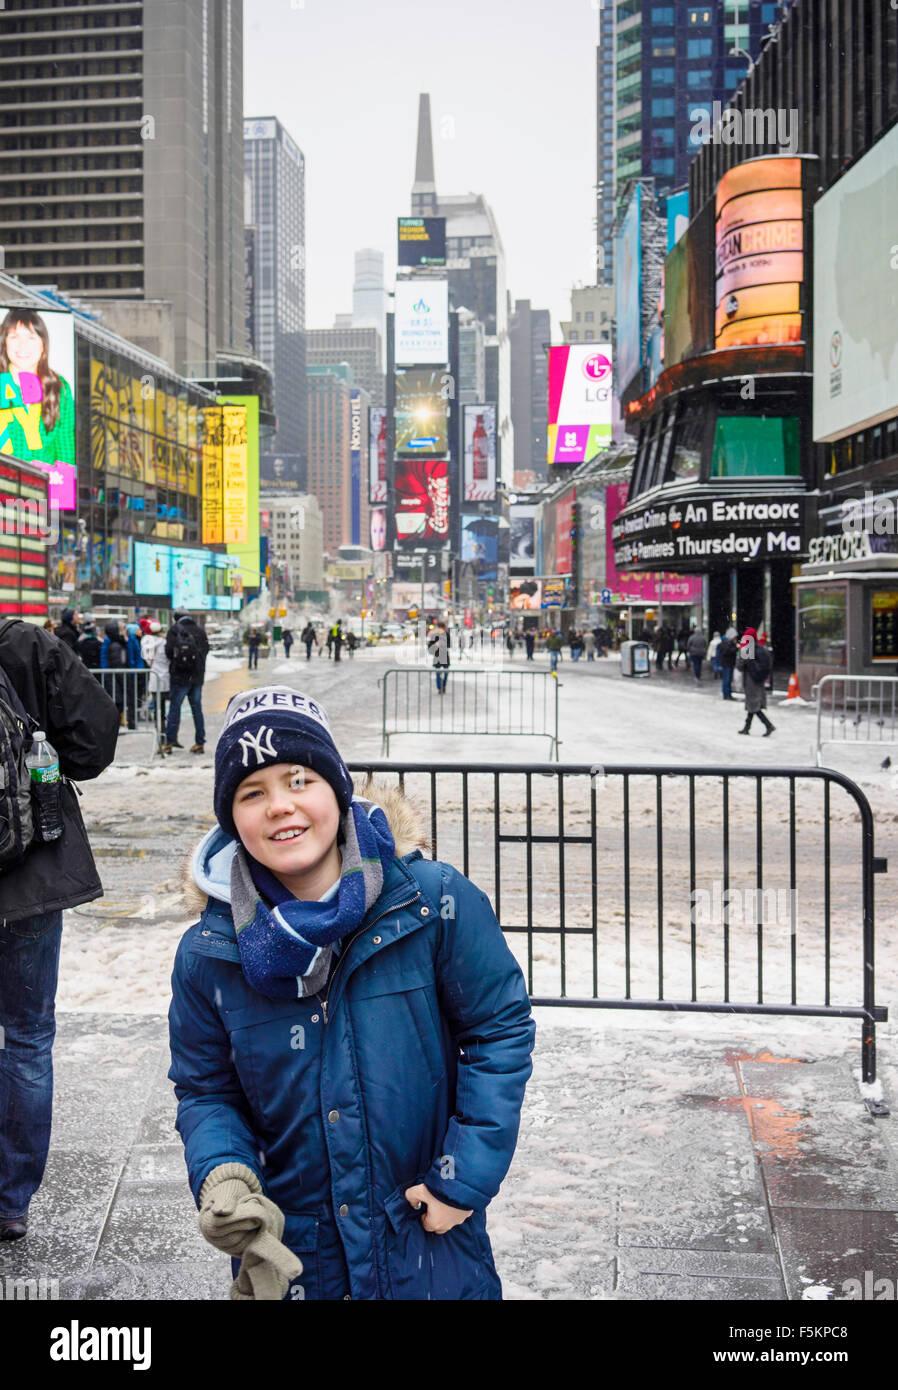 USA, New York, Manhattan, Times Square, Boy (12-13) sur la place du village Photo Stock